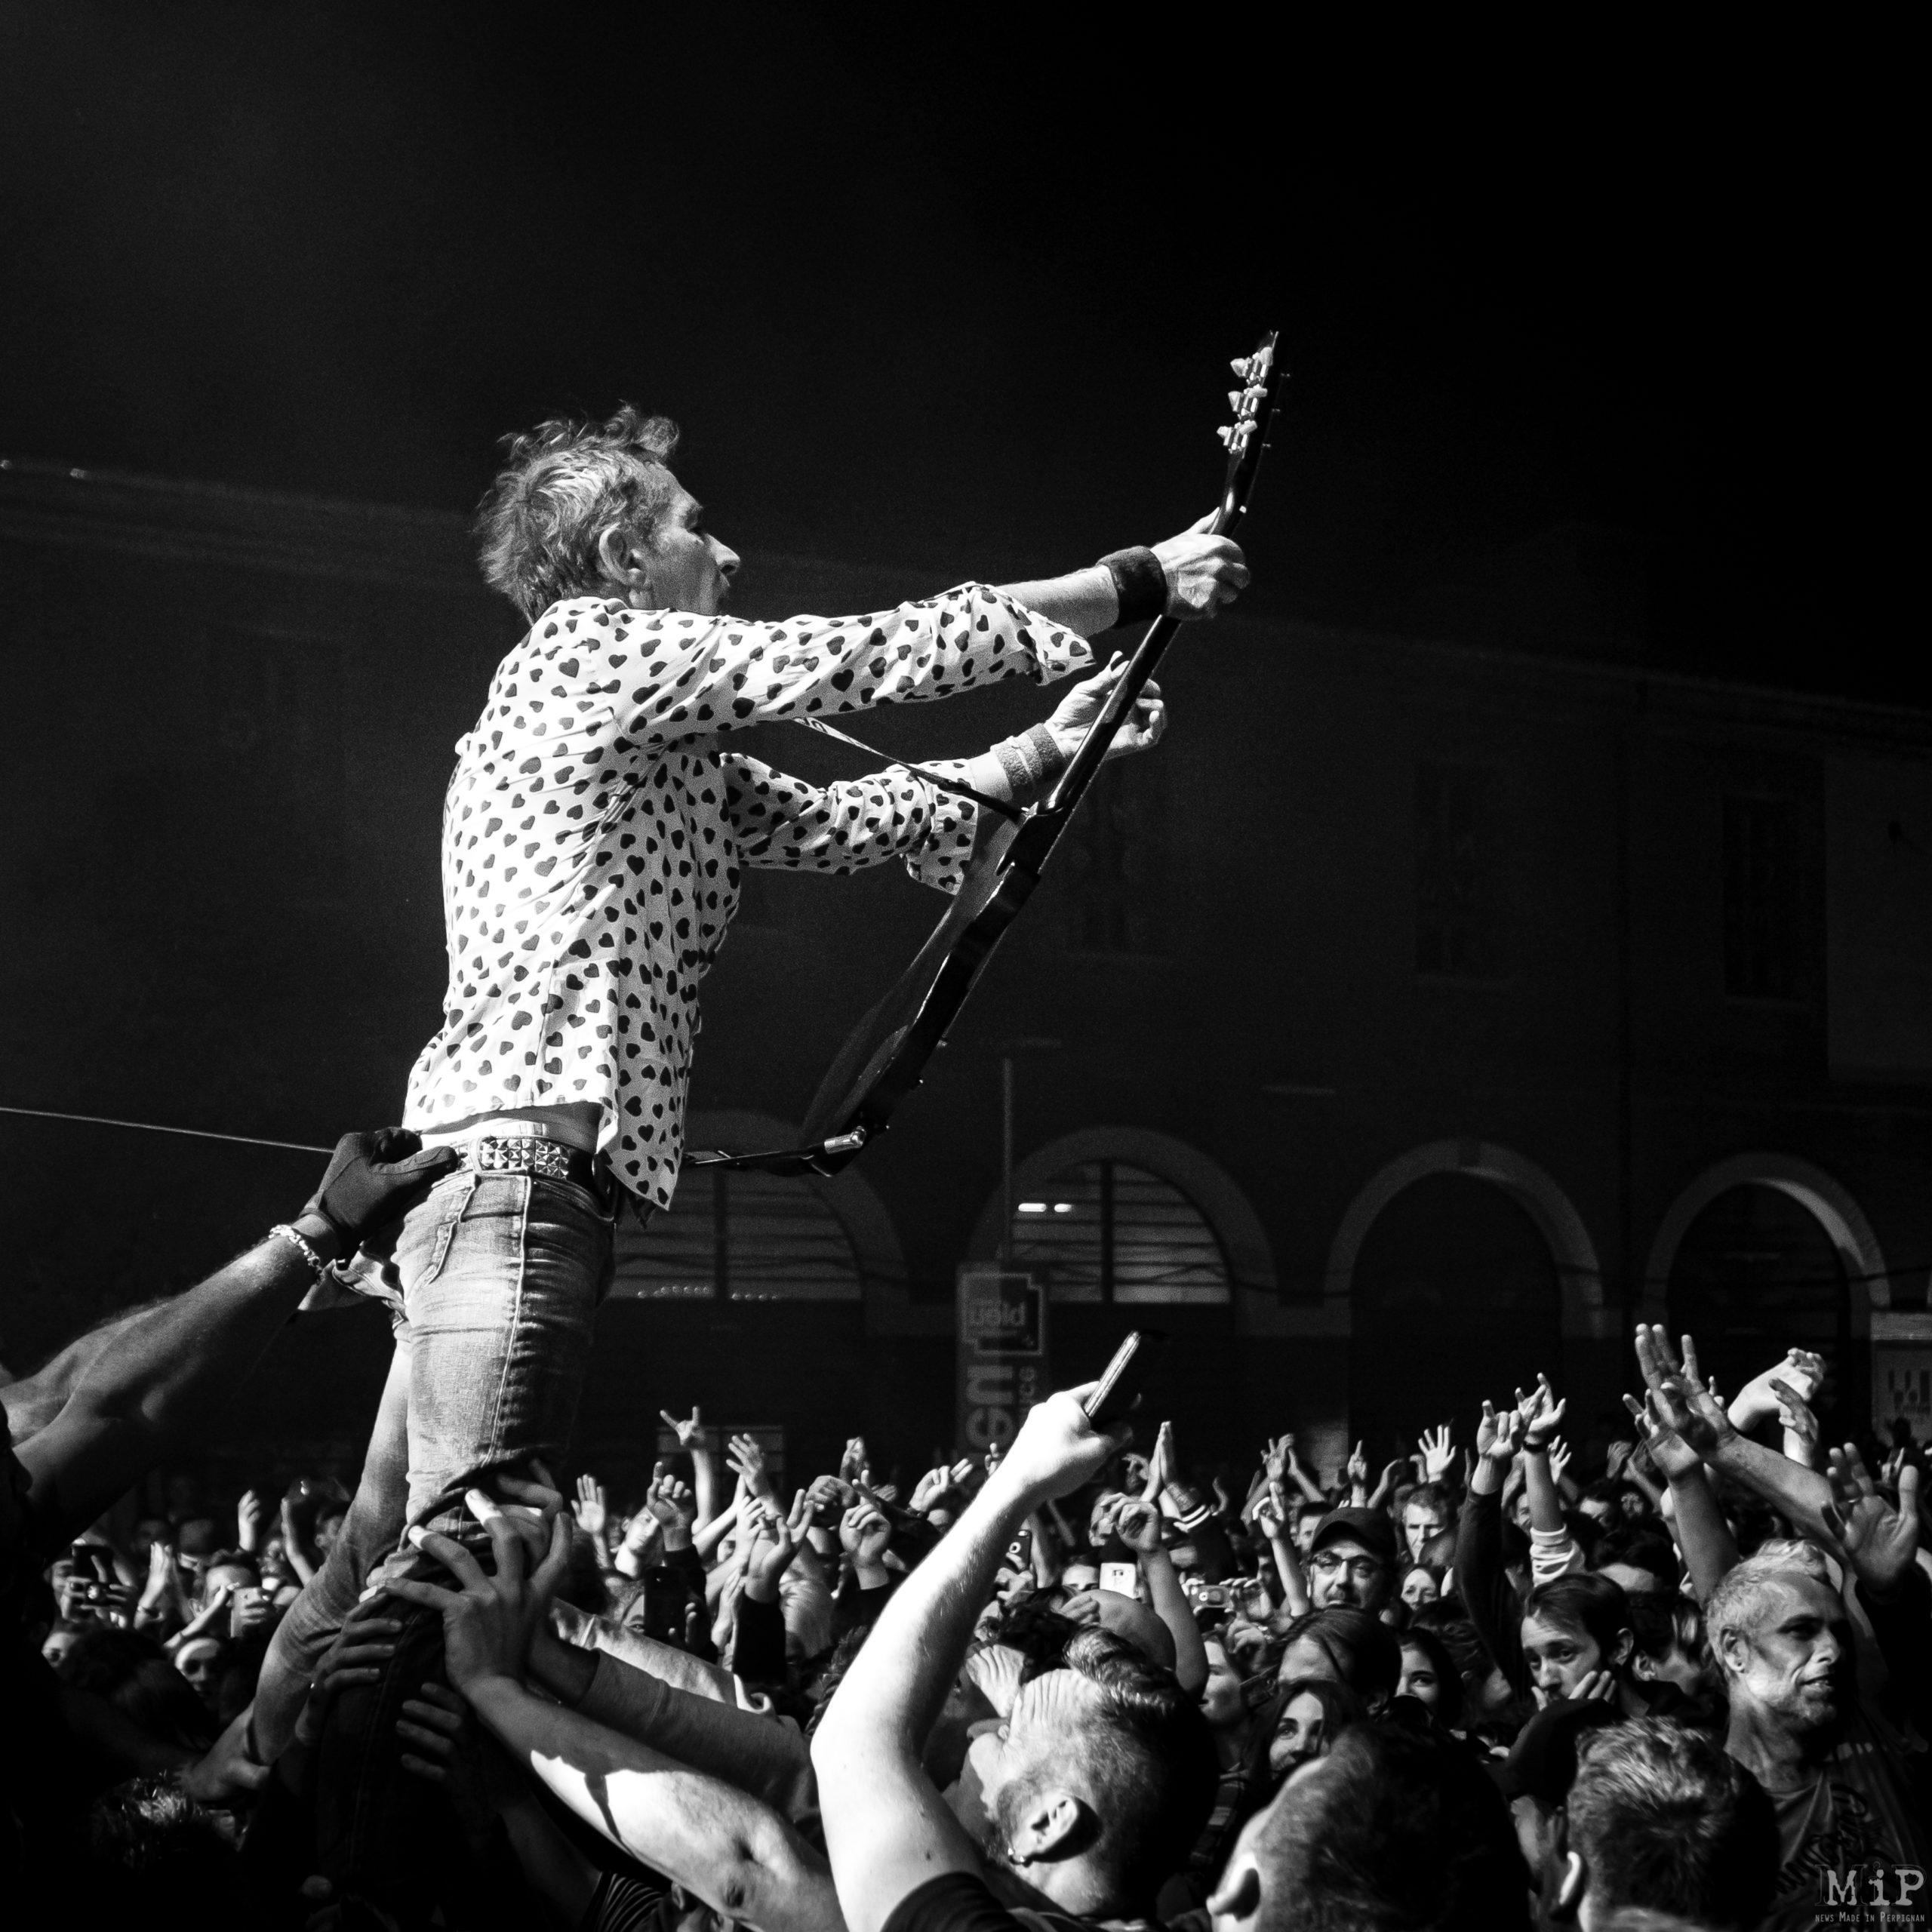 Perpignan, France, Les Wampas Festival Ida Y Vuelta 2019 Casa Musicale © Arnaud Le Vu / MiP / APM